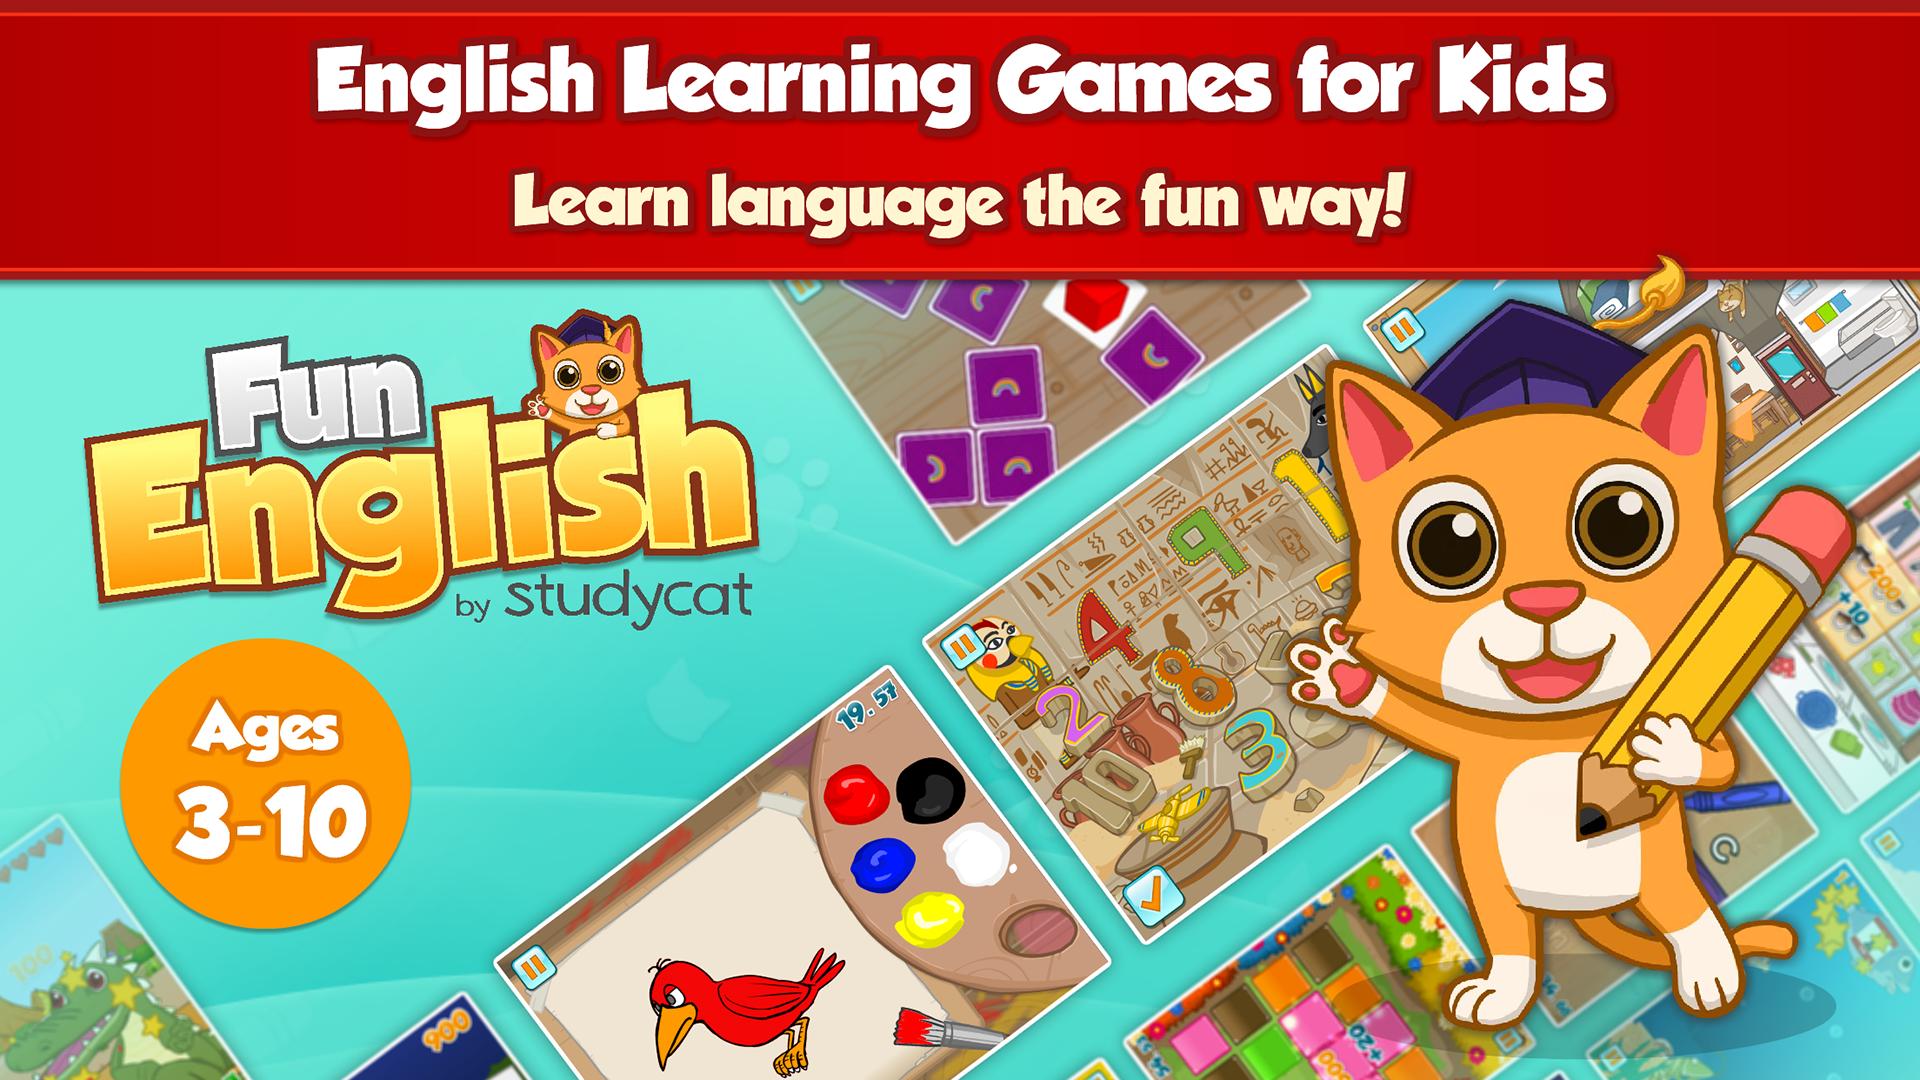 Fun English - Language Learning Games for Kids aged 3-10